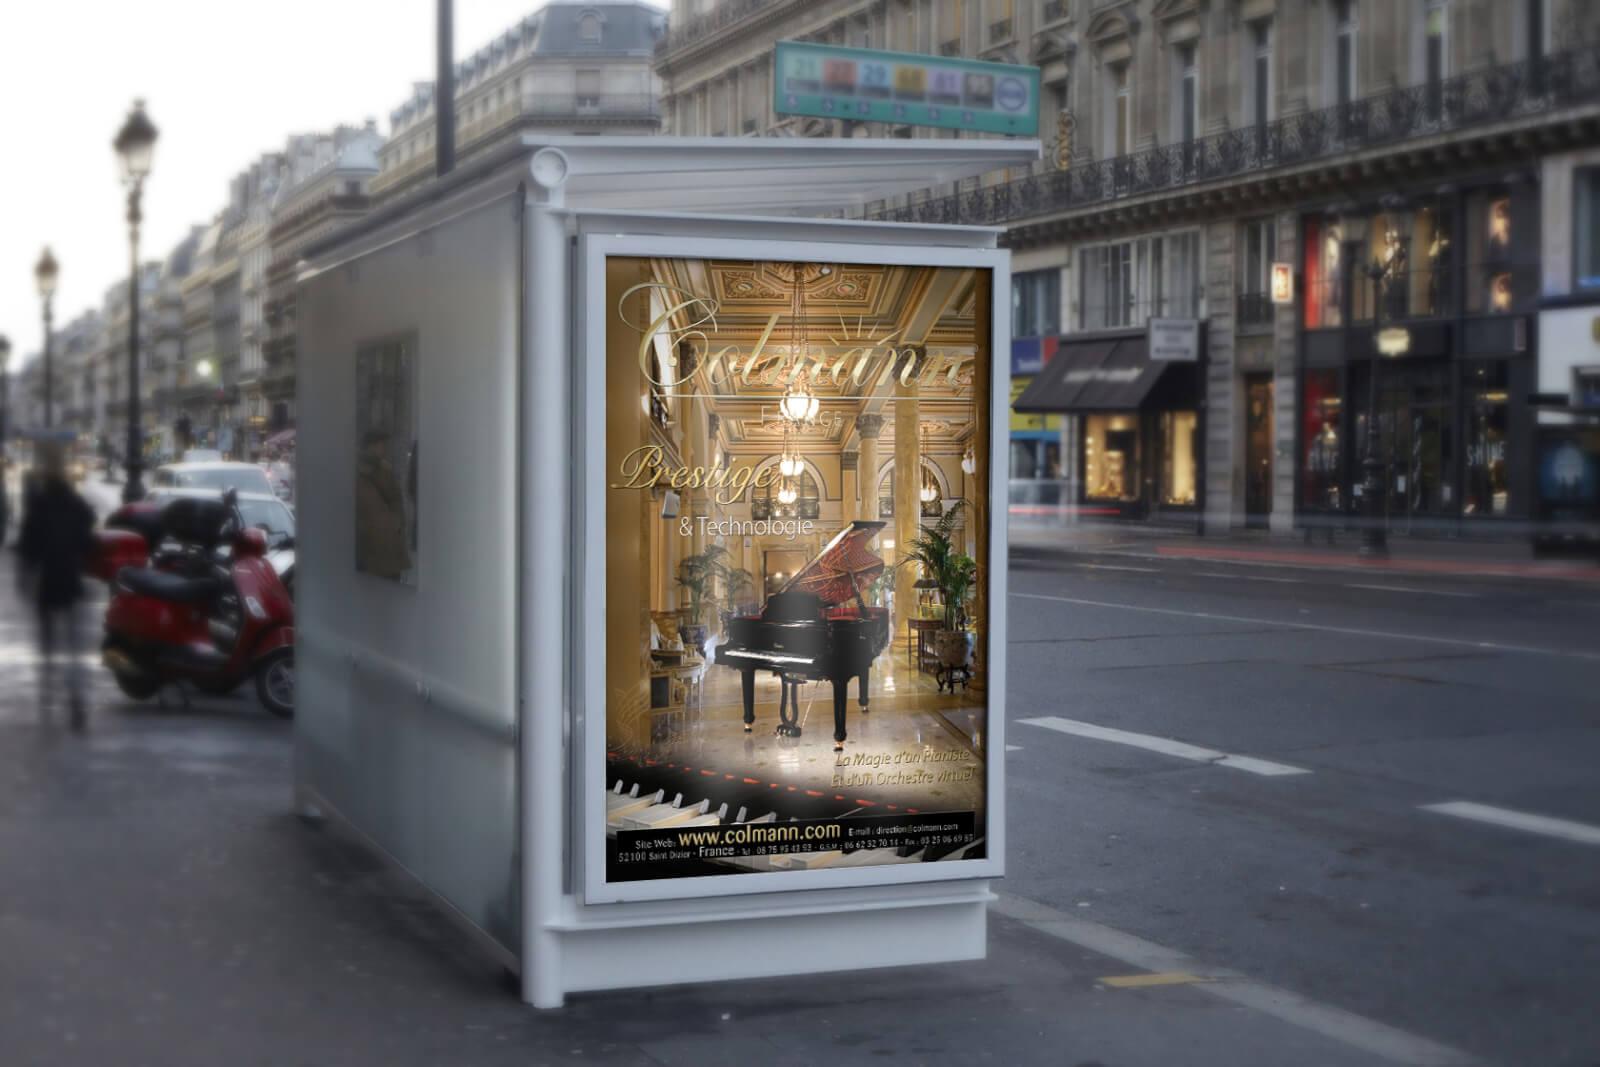 Affiche Prestige Pianos Colmann France